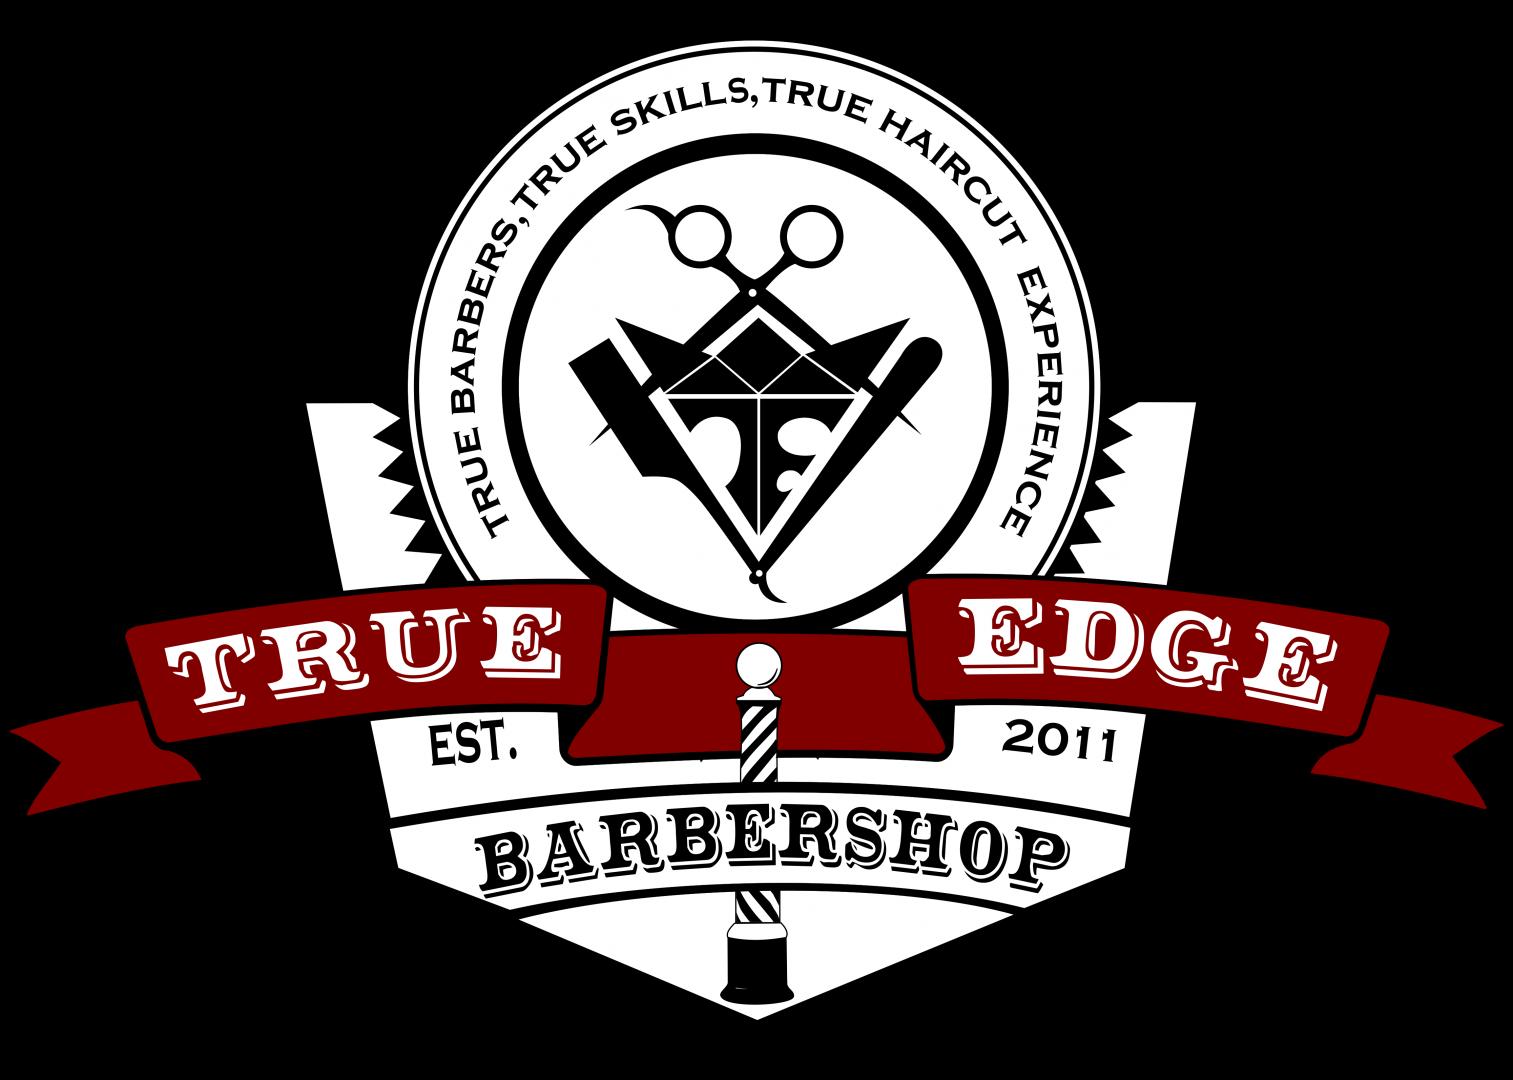 True Edge Barbershop